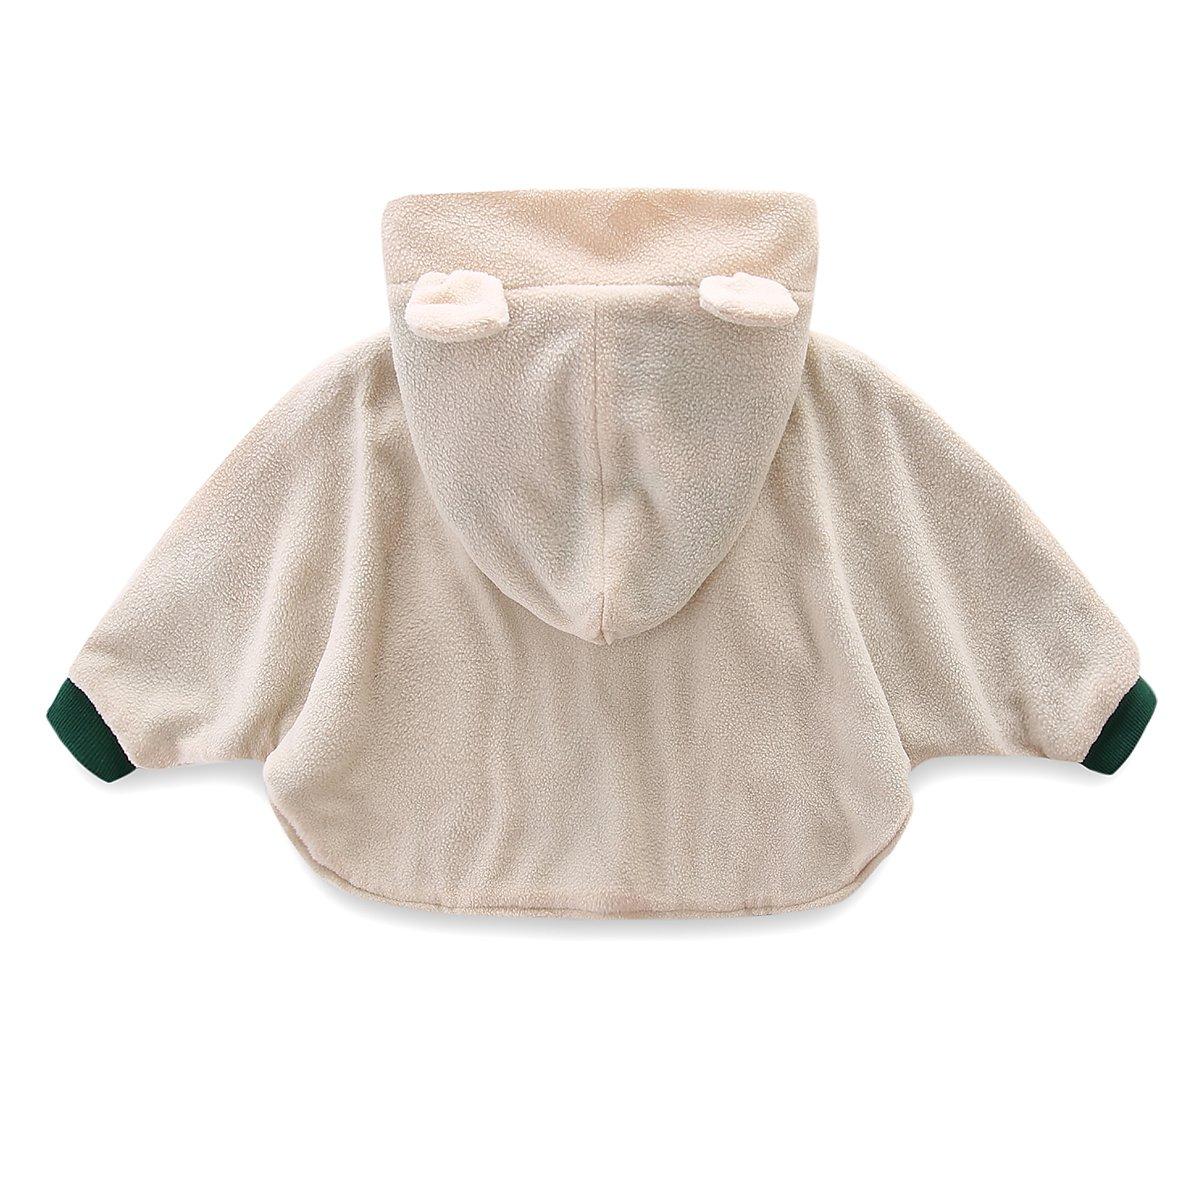 b6a7138085b5 Amazon.com  Mud Kingdom Baby Mushroom Costume Fleece Cloak Coat ...